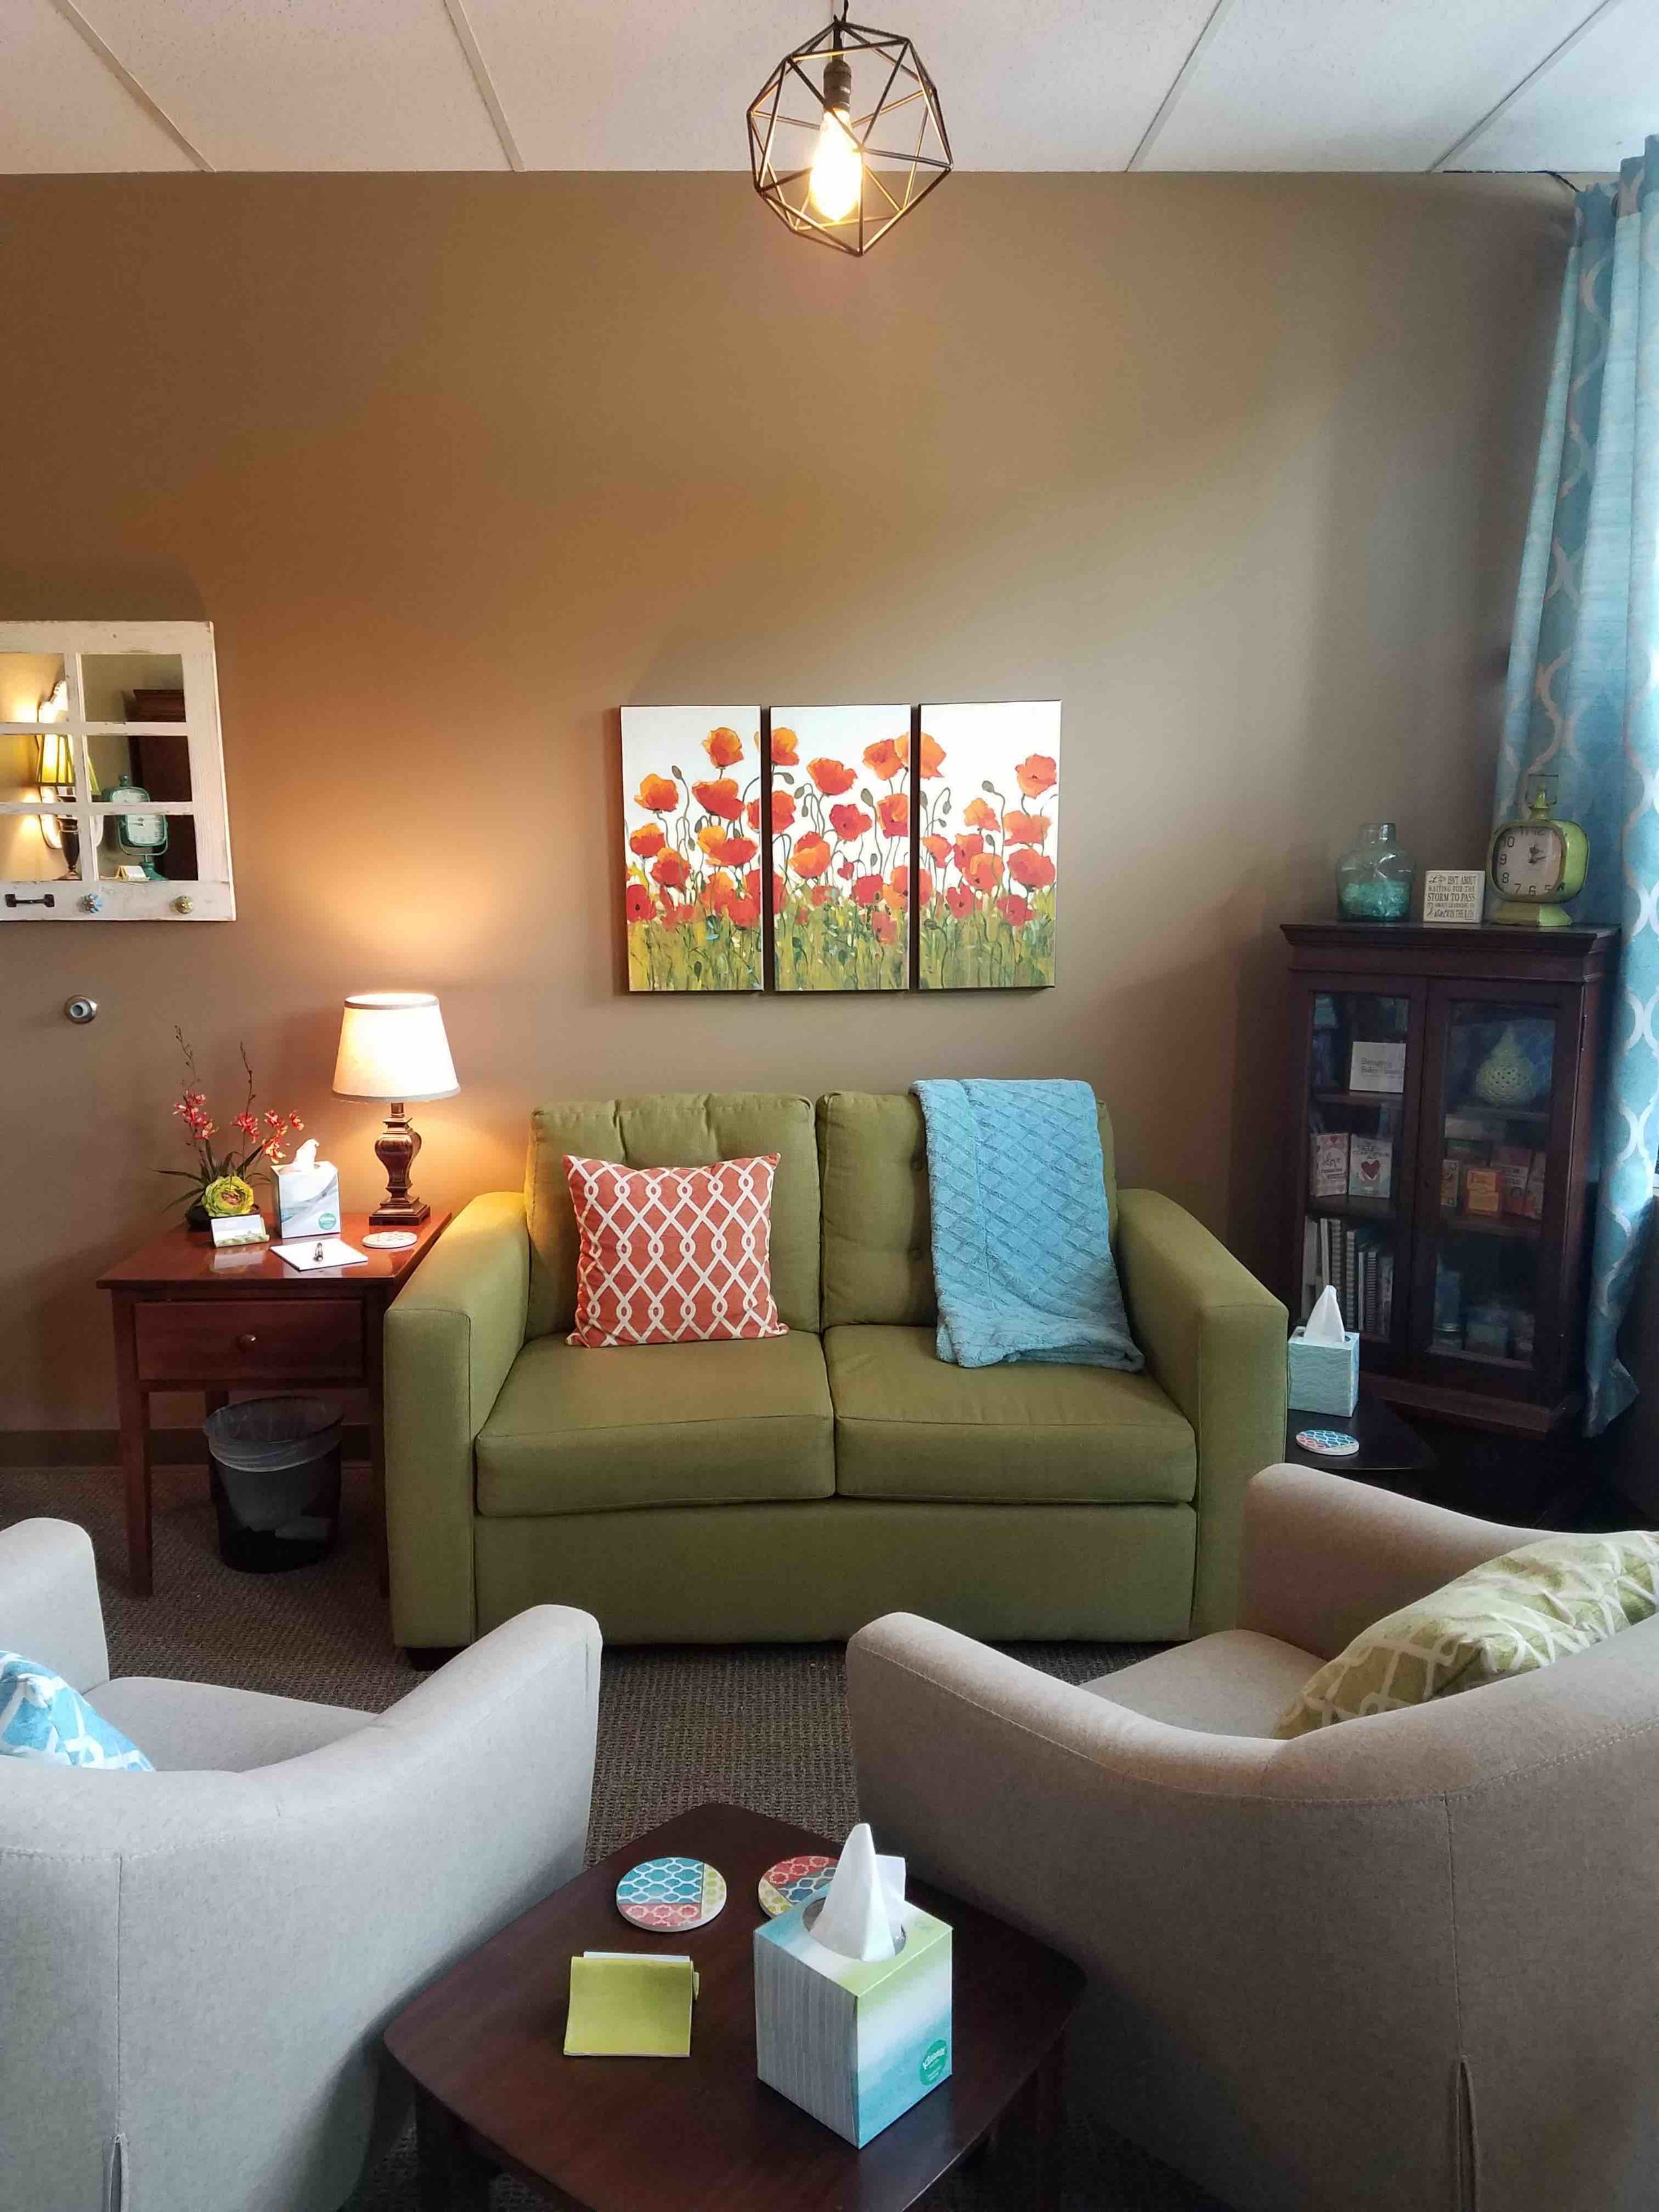 Counseling Alliance LLC - Paula Alberto's Office.jpg